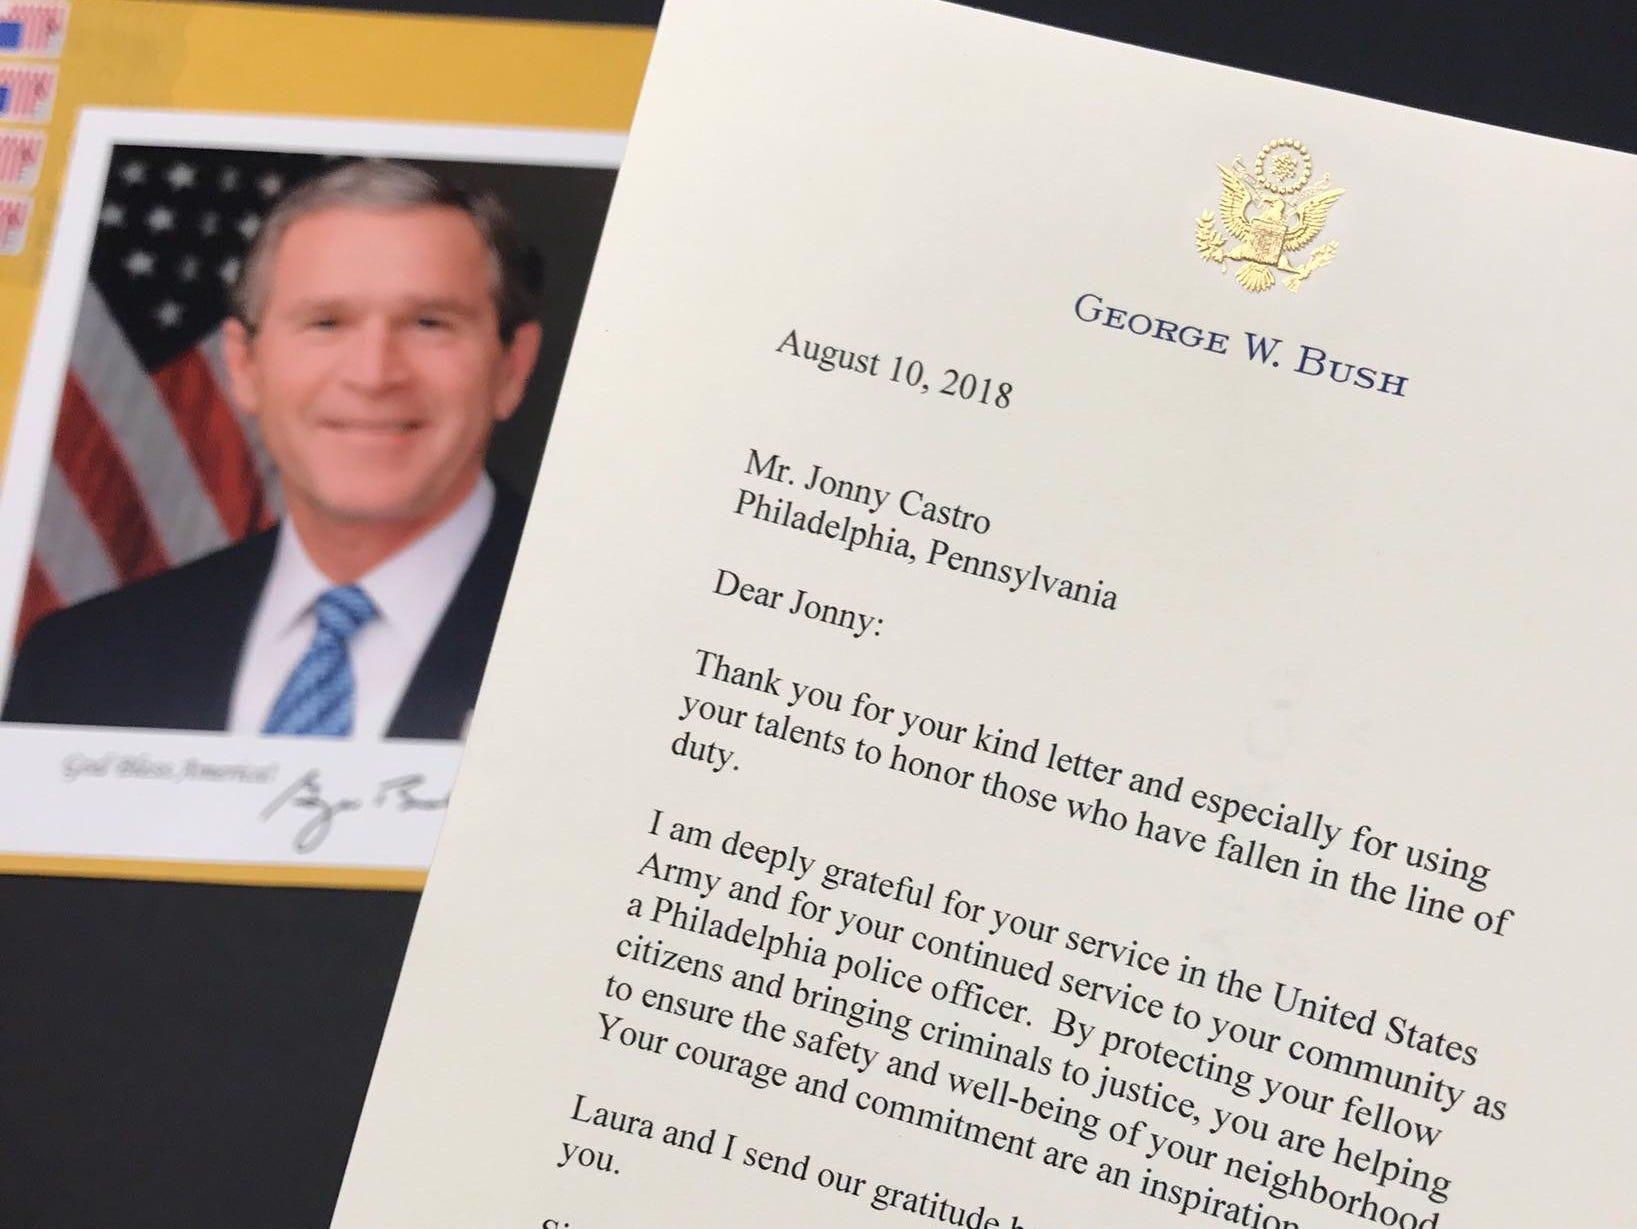 Jonny Castro's letter from George Bush.